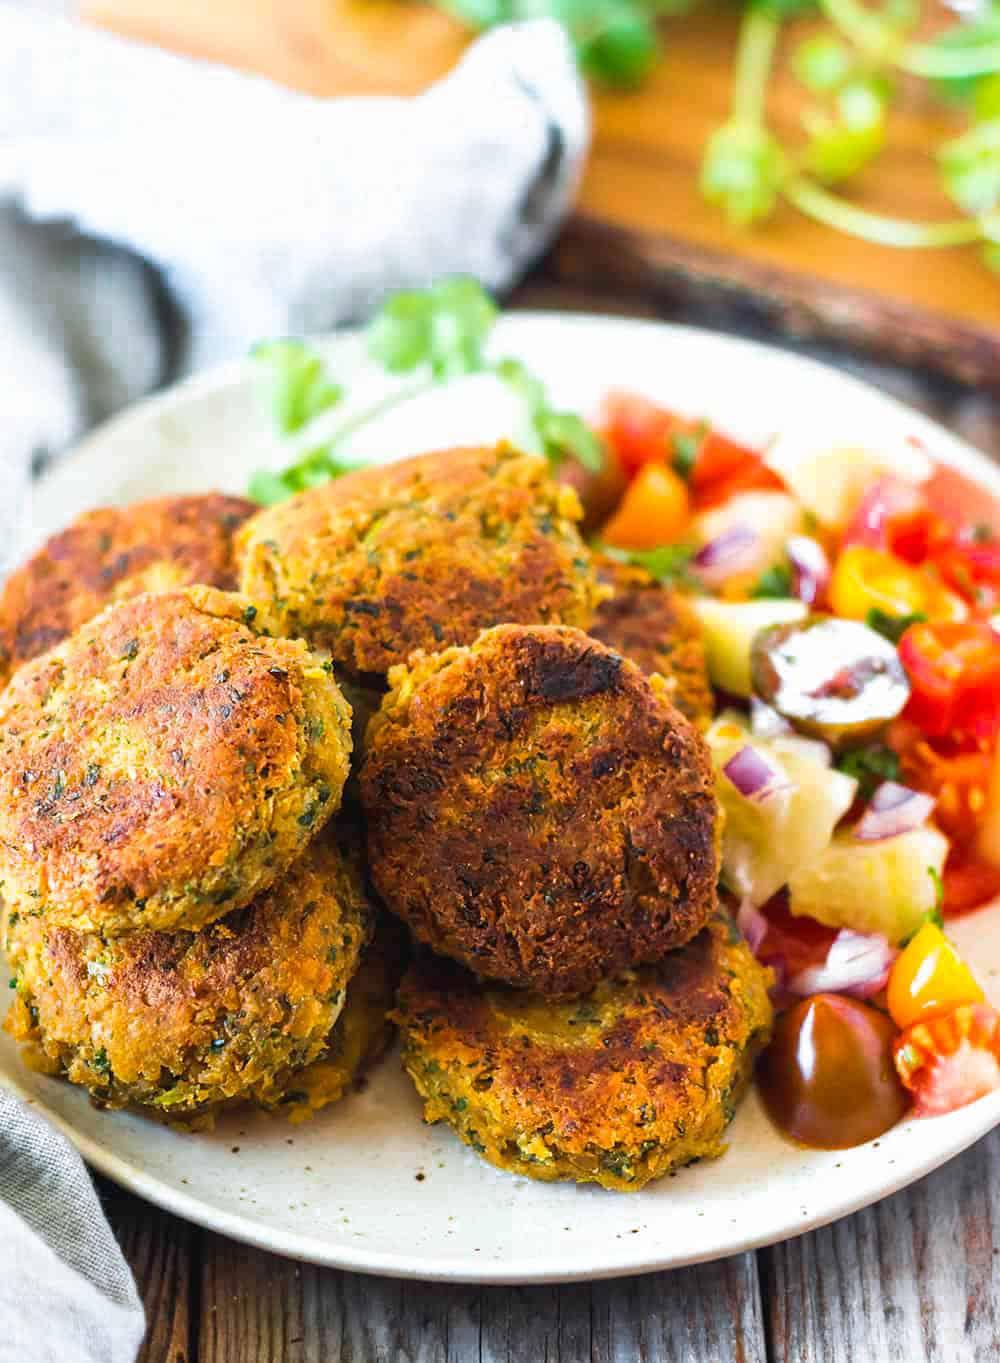 Vegan, Gluten-Free Falafel Recipe